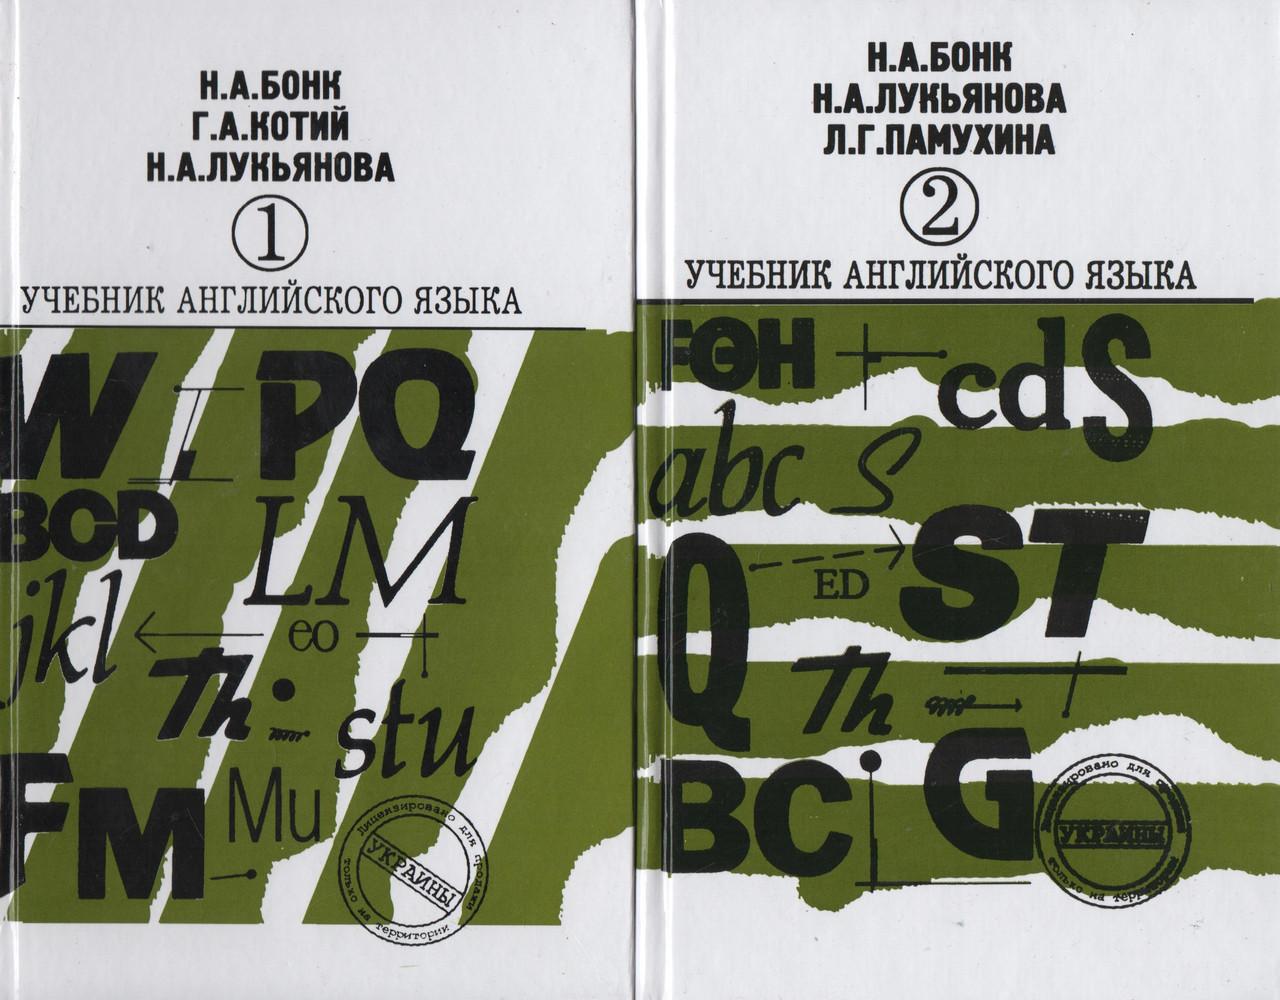 Н.а.лукьянова г.а.котий гдз н.а.бонк учебник